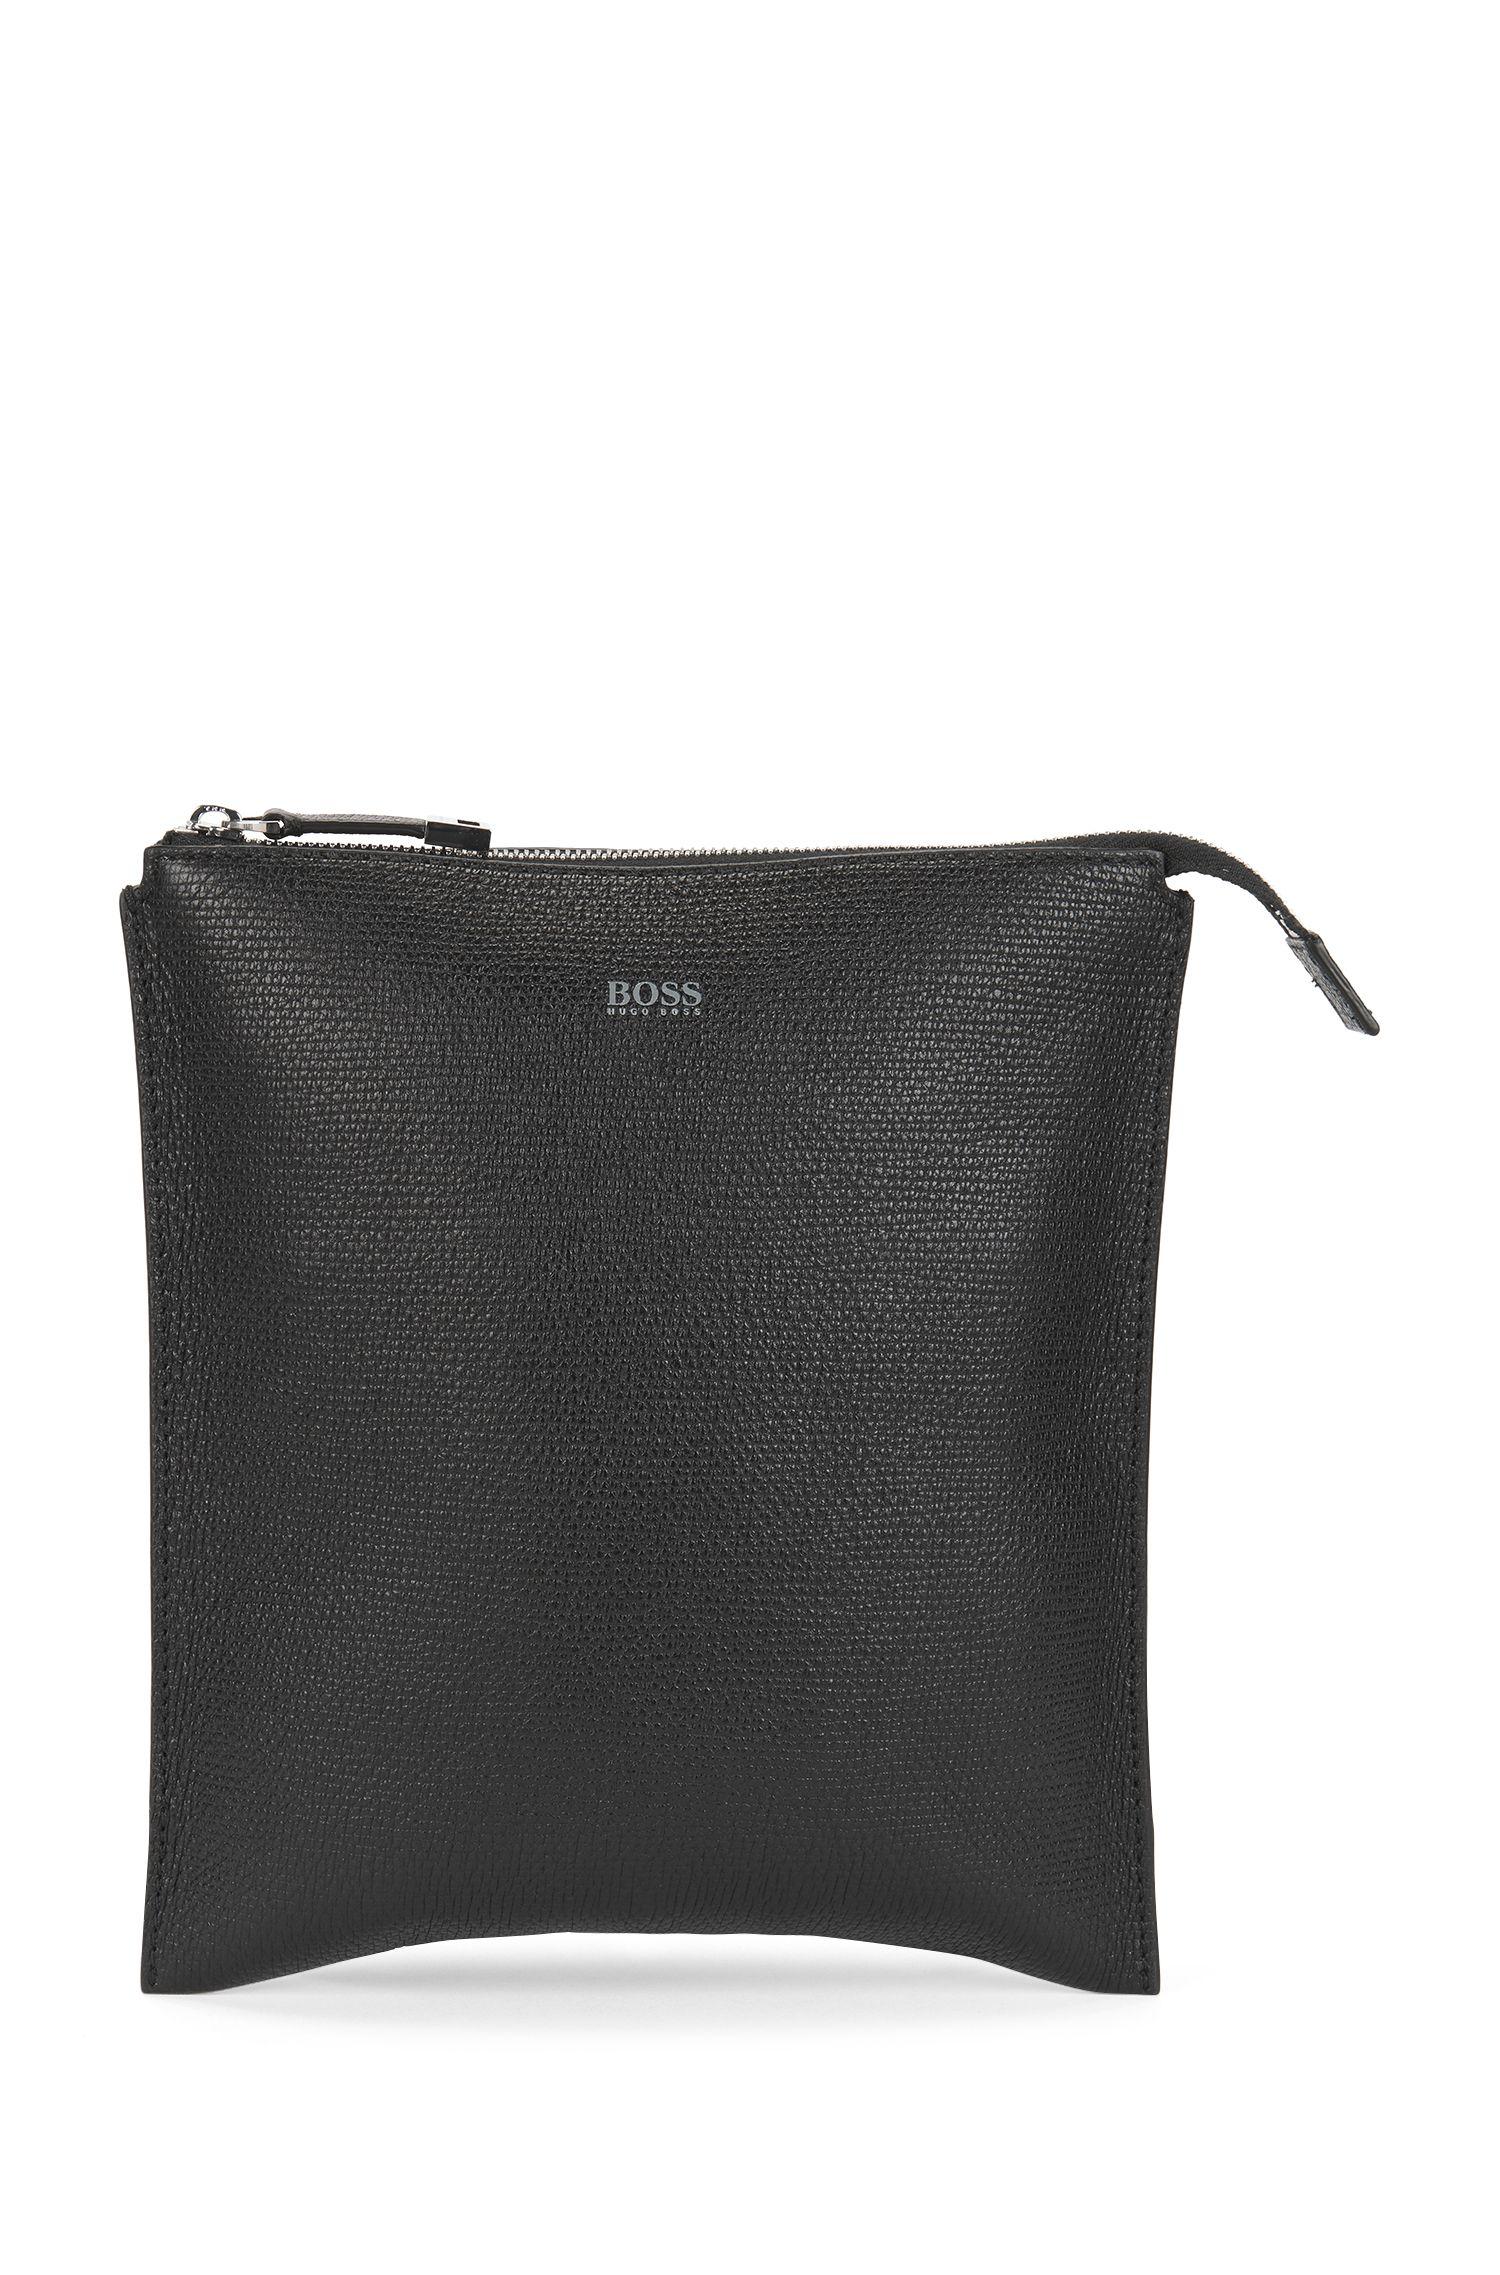 Envelope bag in printed Italian leather